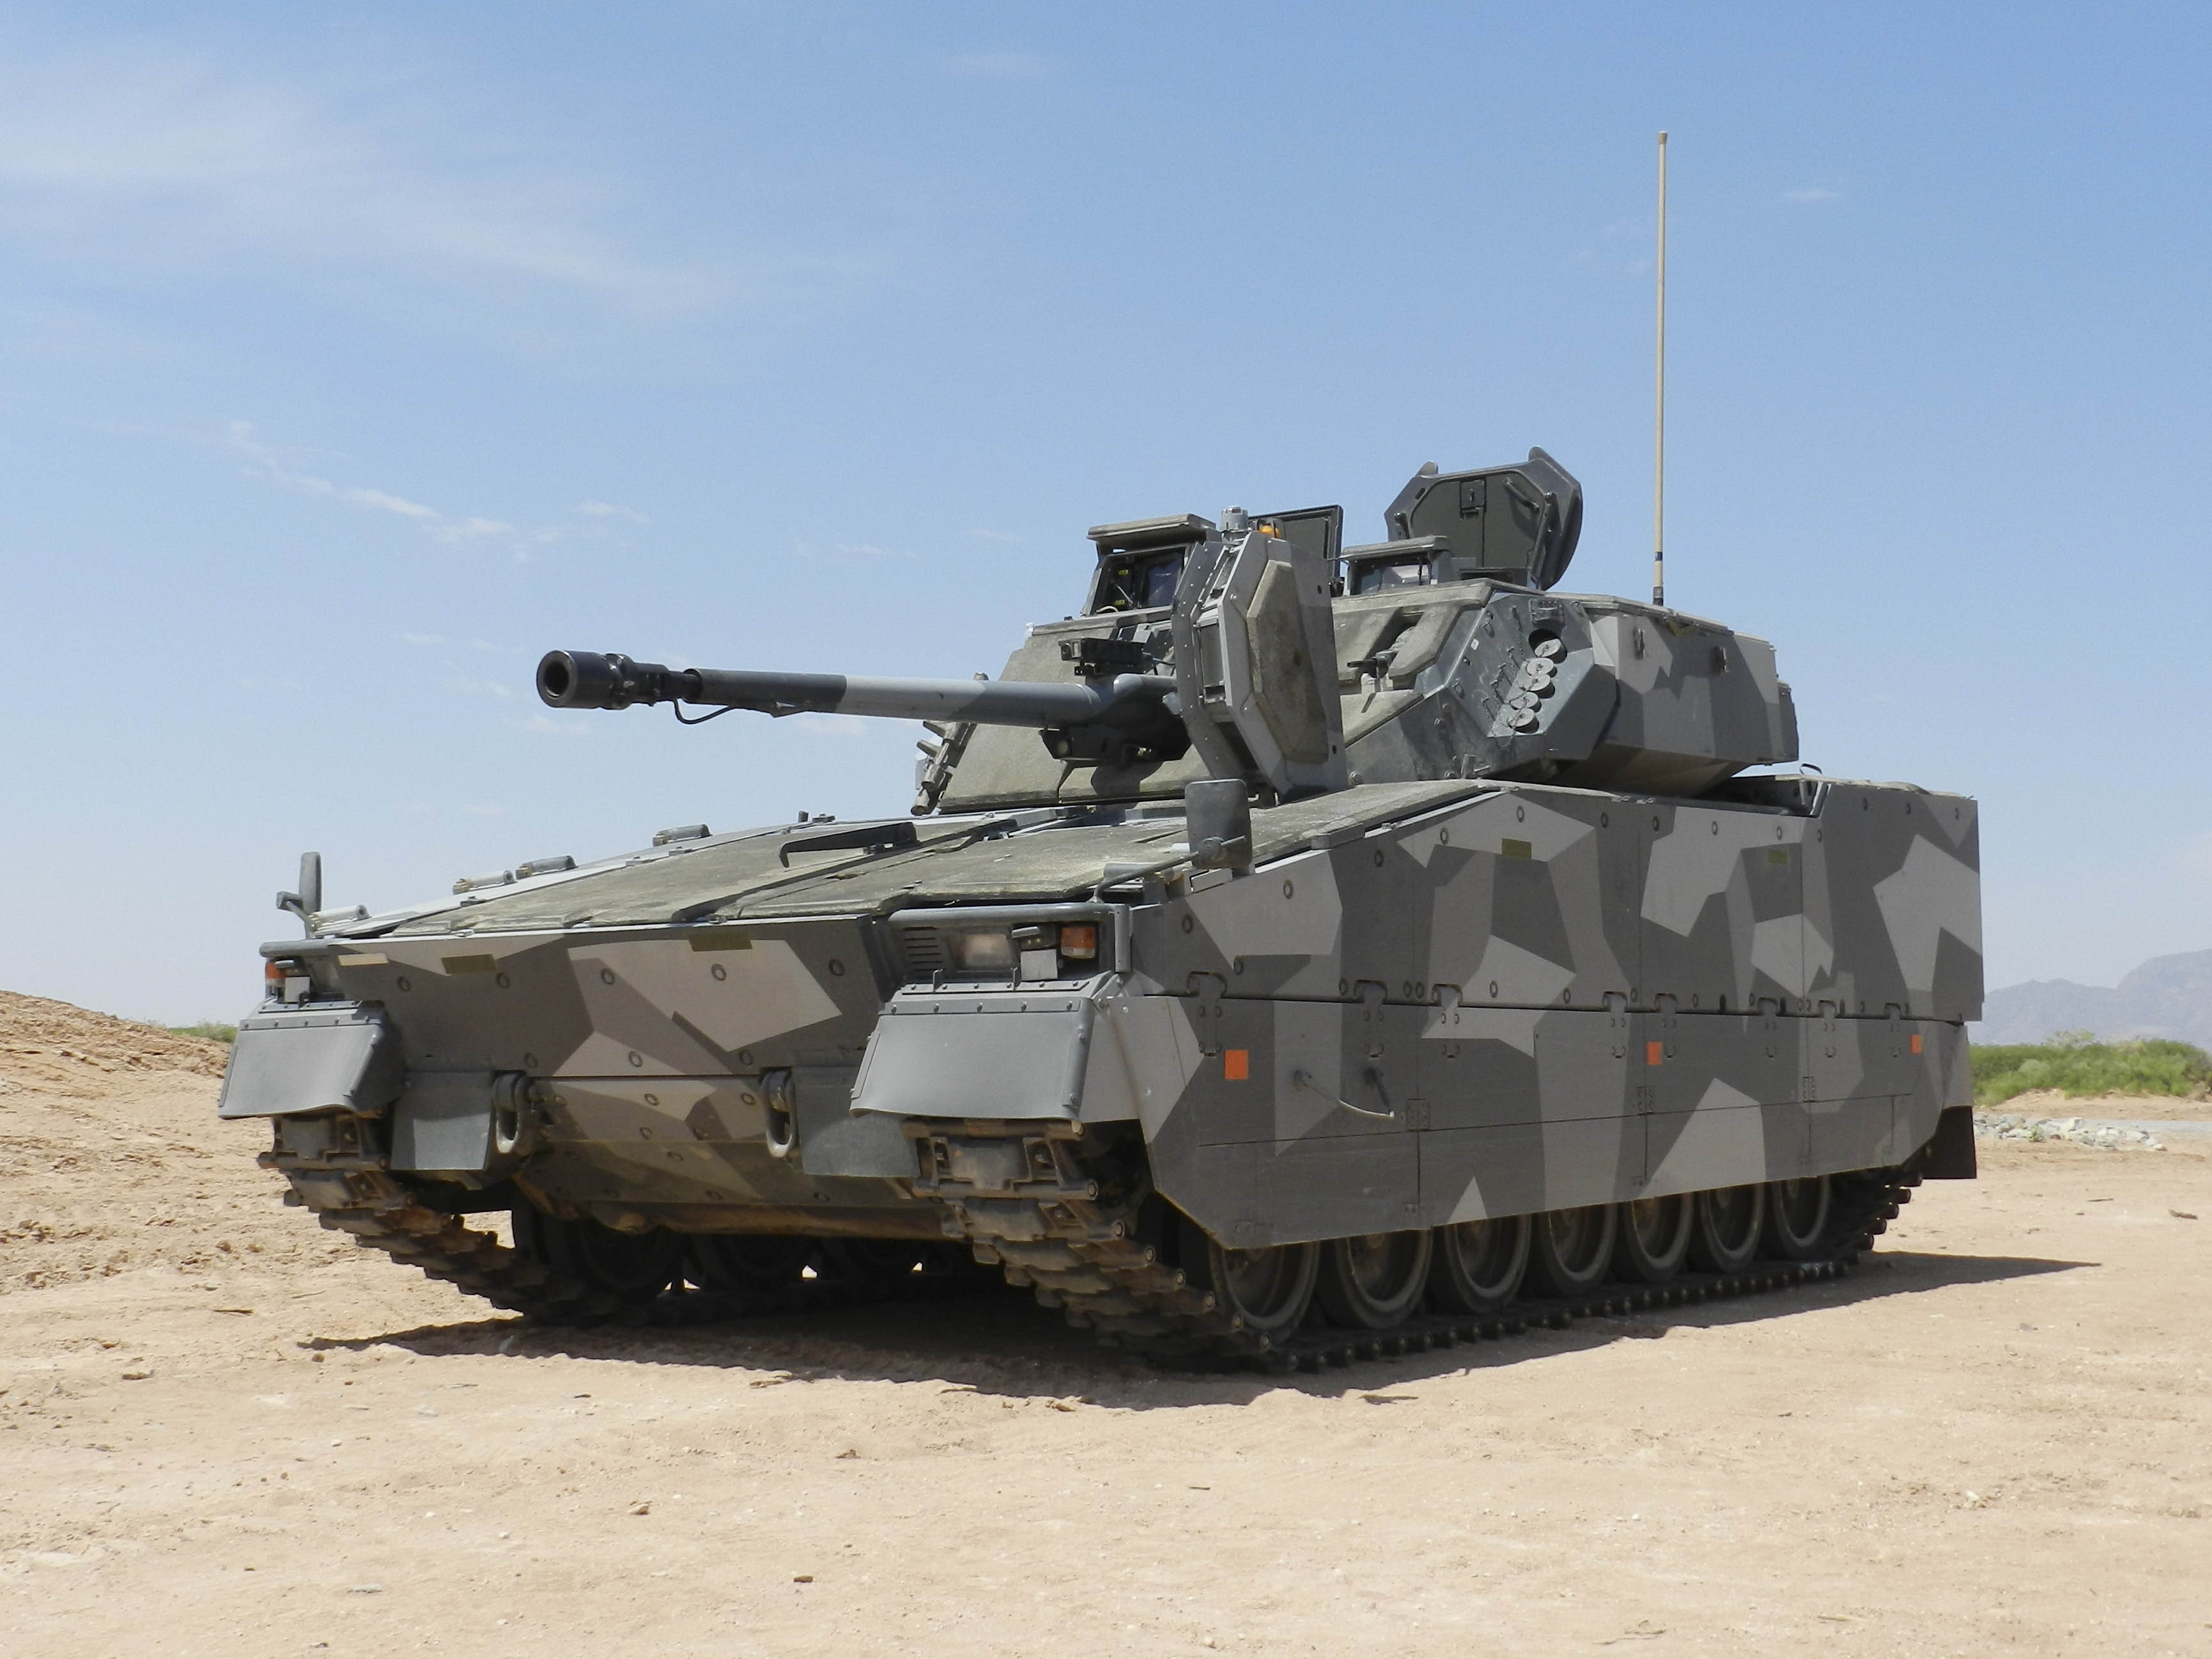 Ground Combat Vehicle • Military Weapons | Gun Reviews